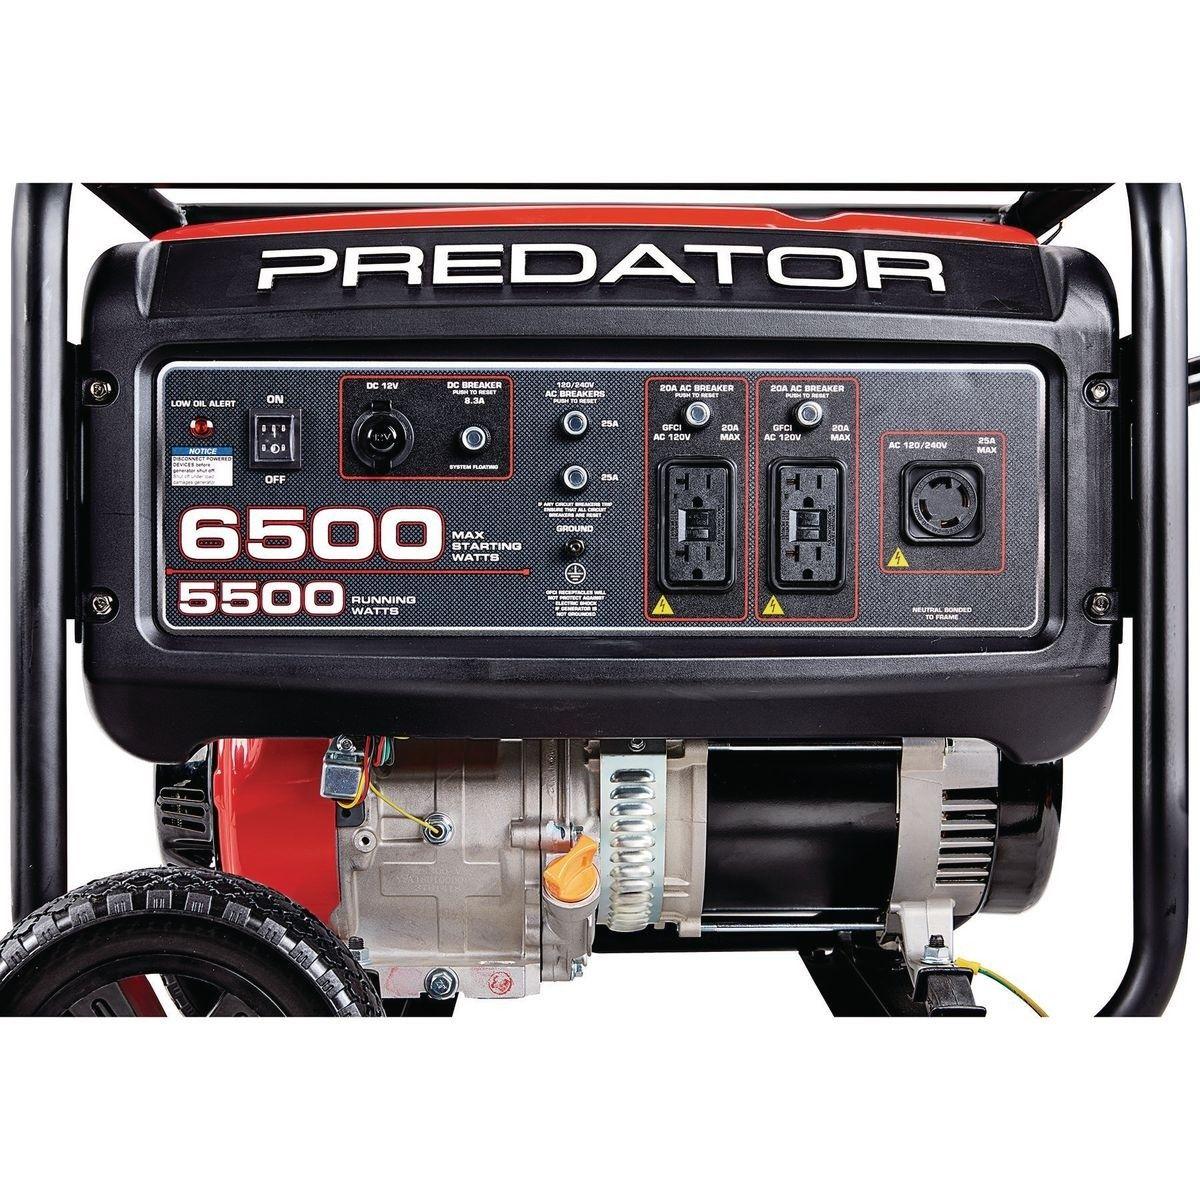 6500 watt max starting gas powered generator carb in